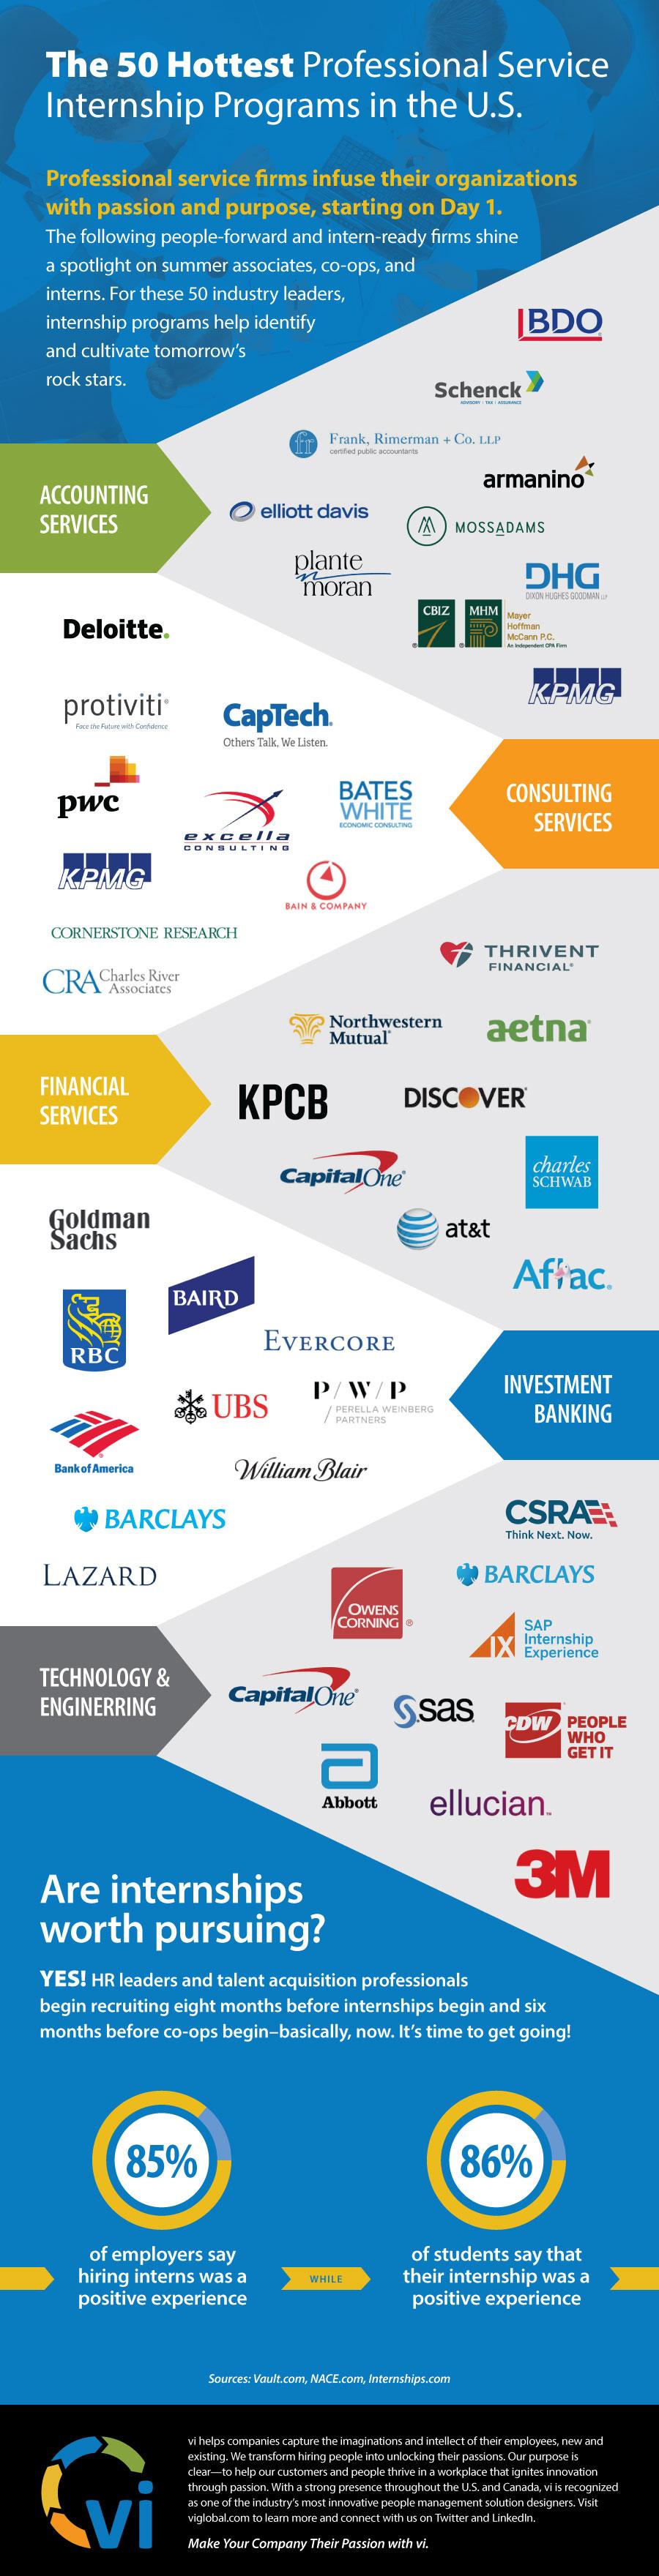 50 Hottest Professional Service Firm Internships